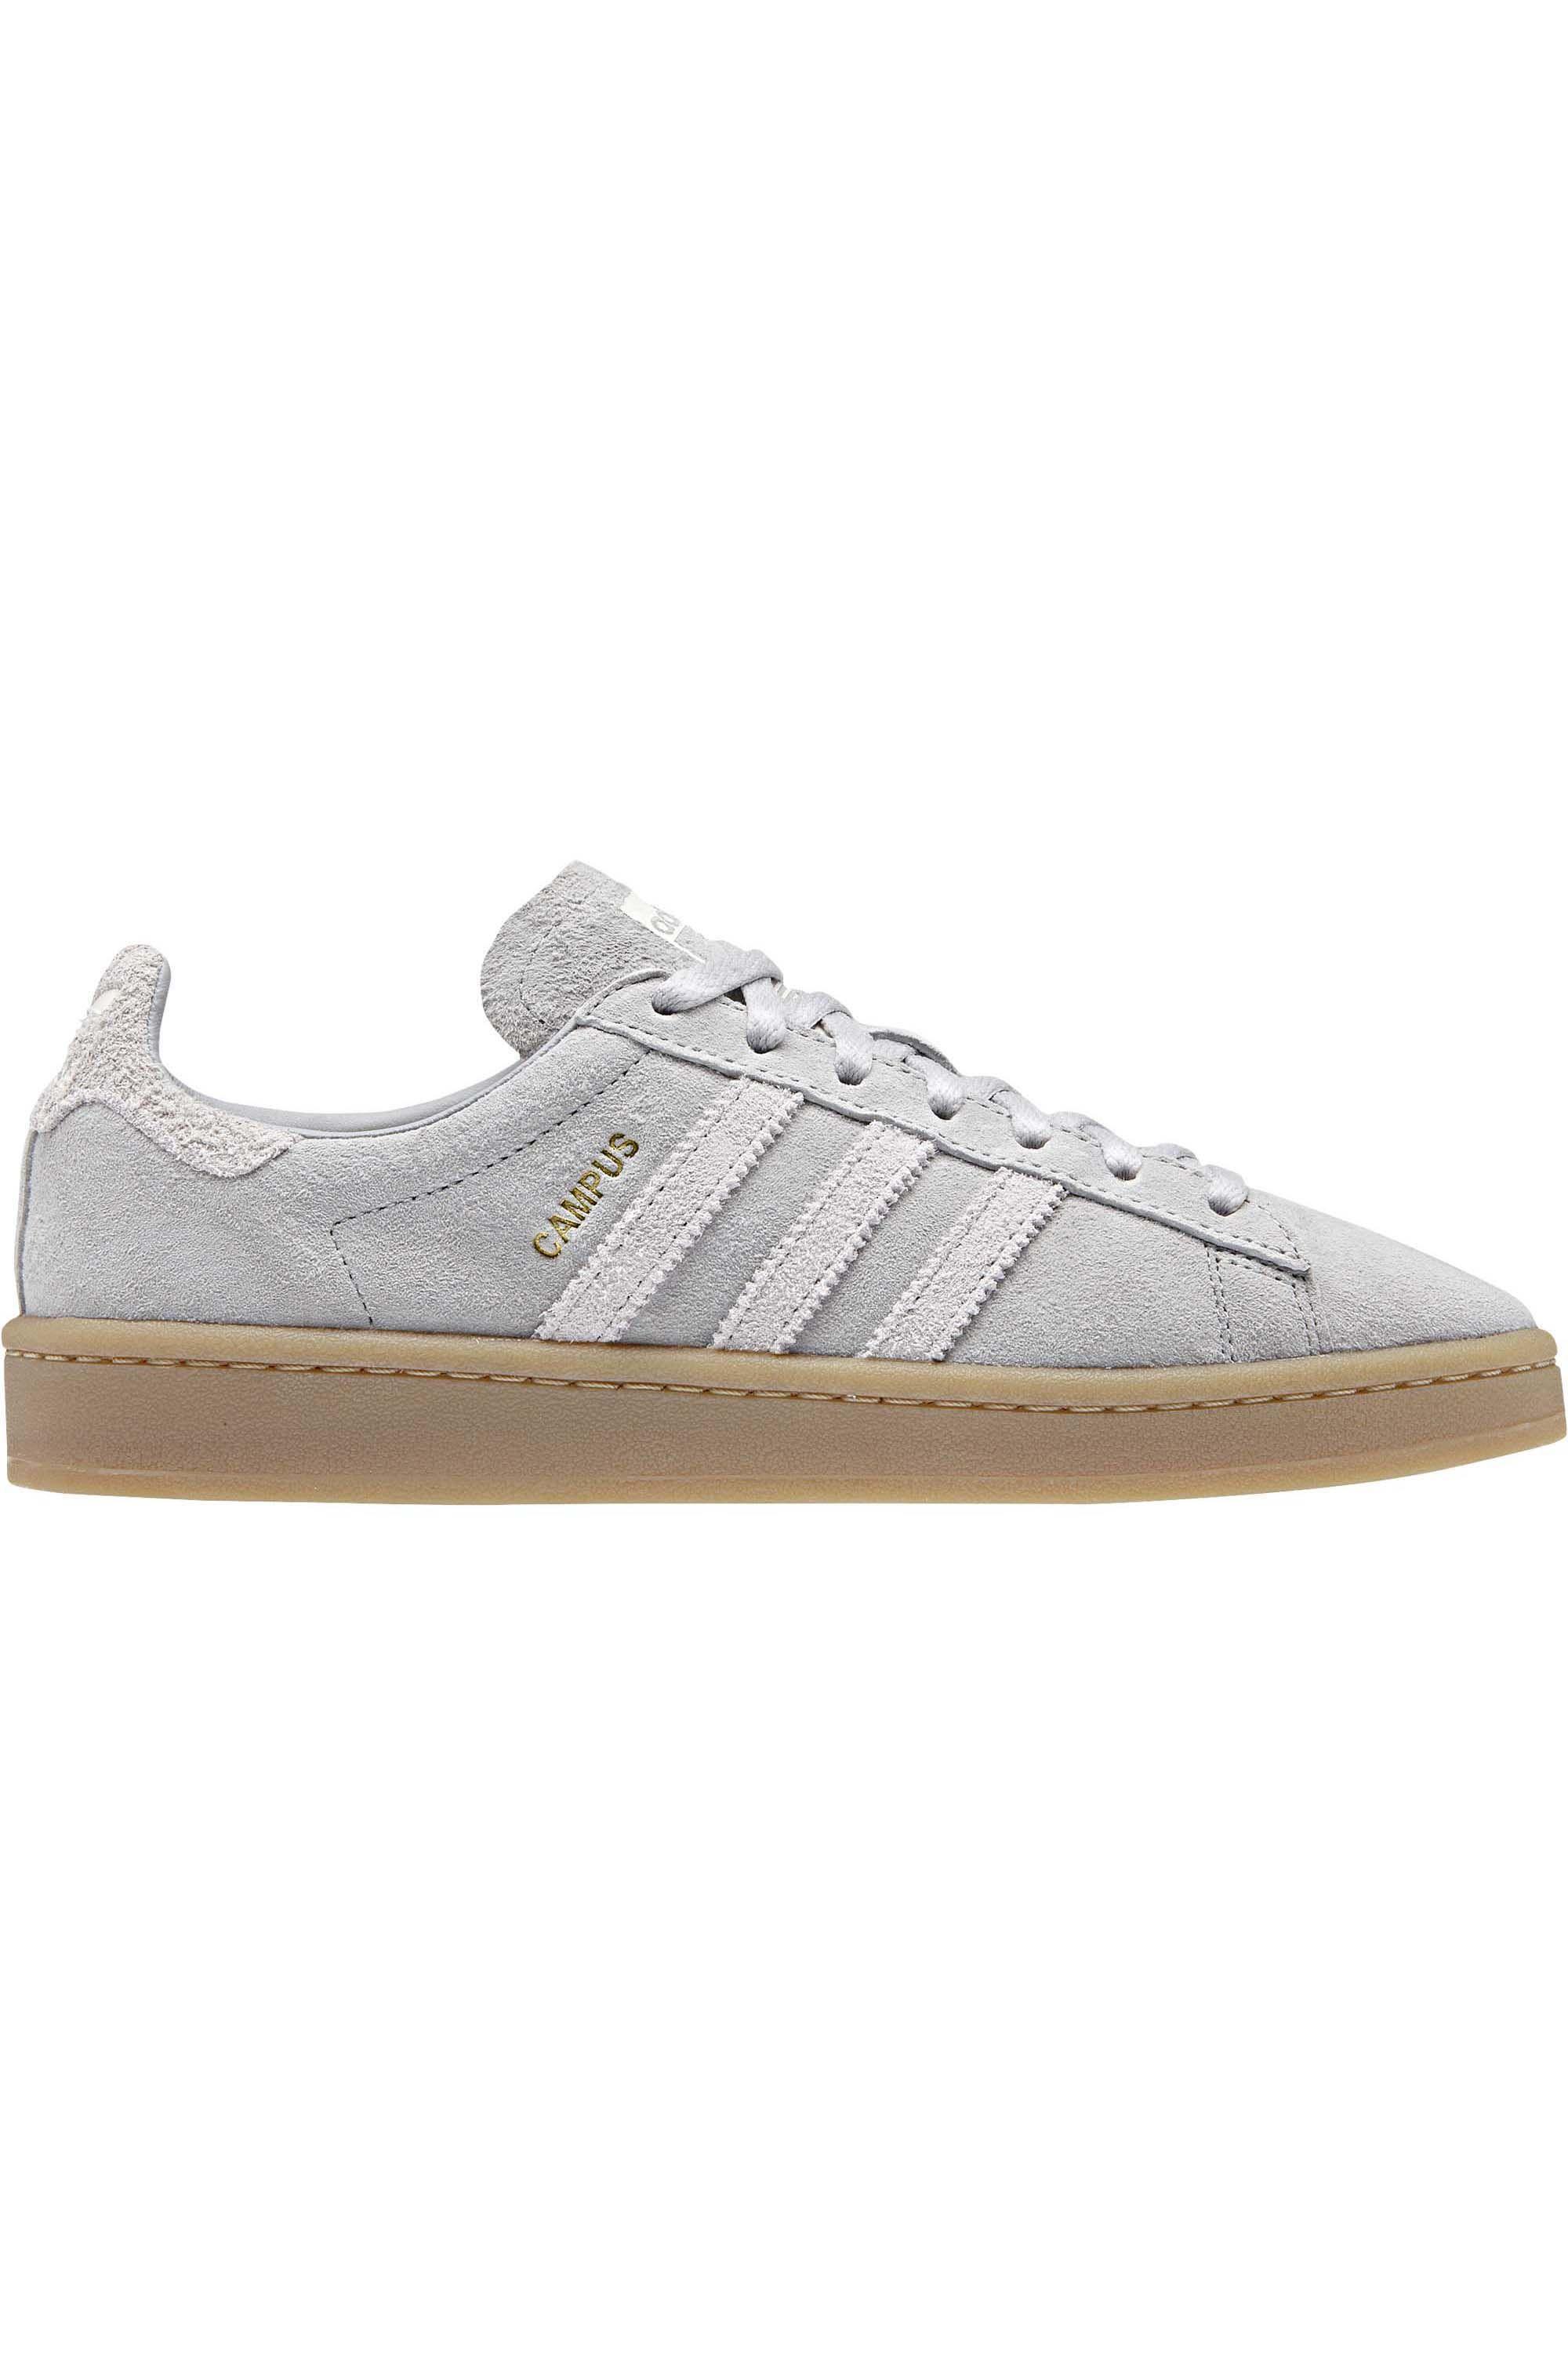 c448348cc Adidas Shoes CAMPUS ADV Collegiate Burgundy/Ftwr White/Ftwr White 46